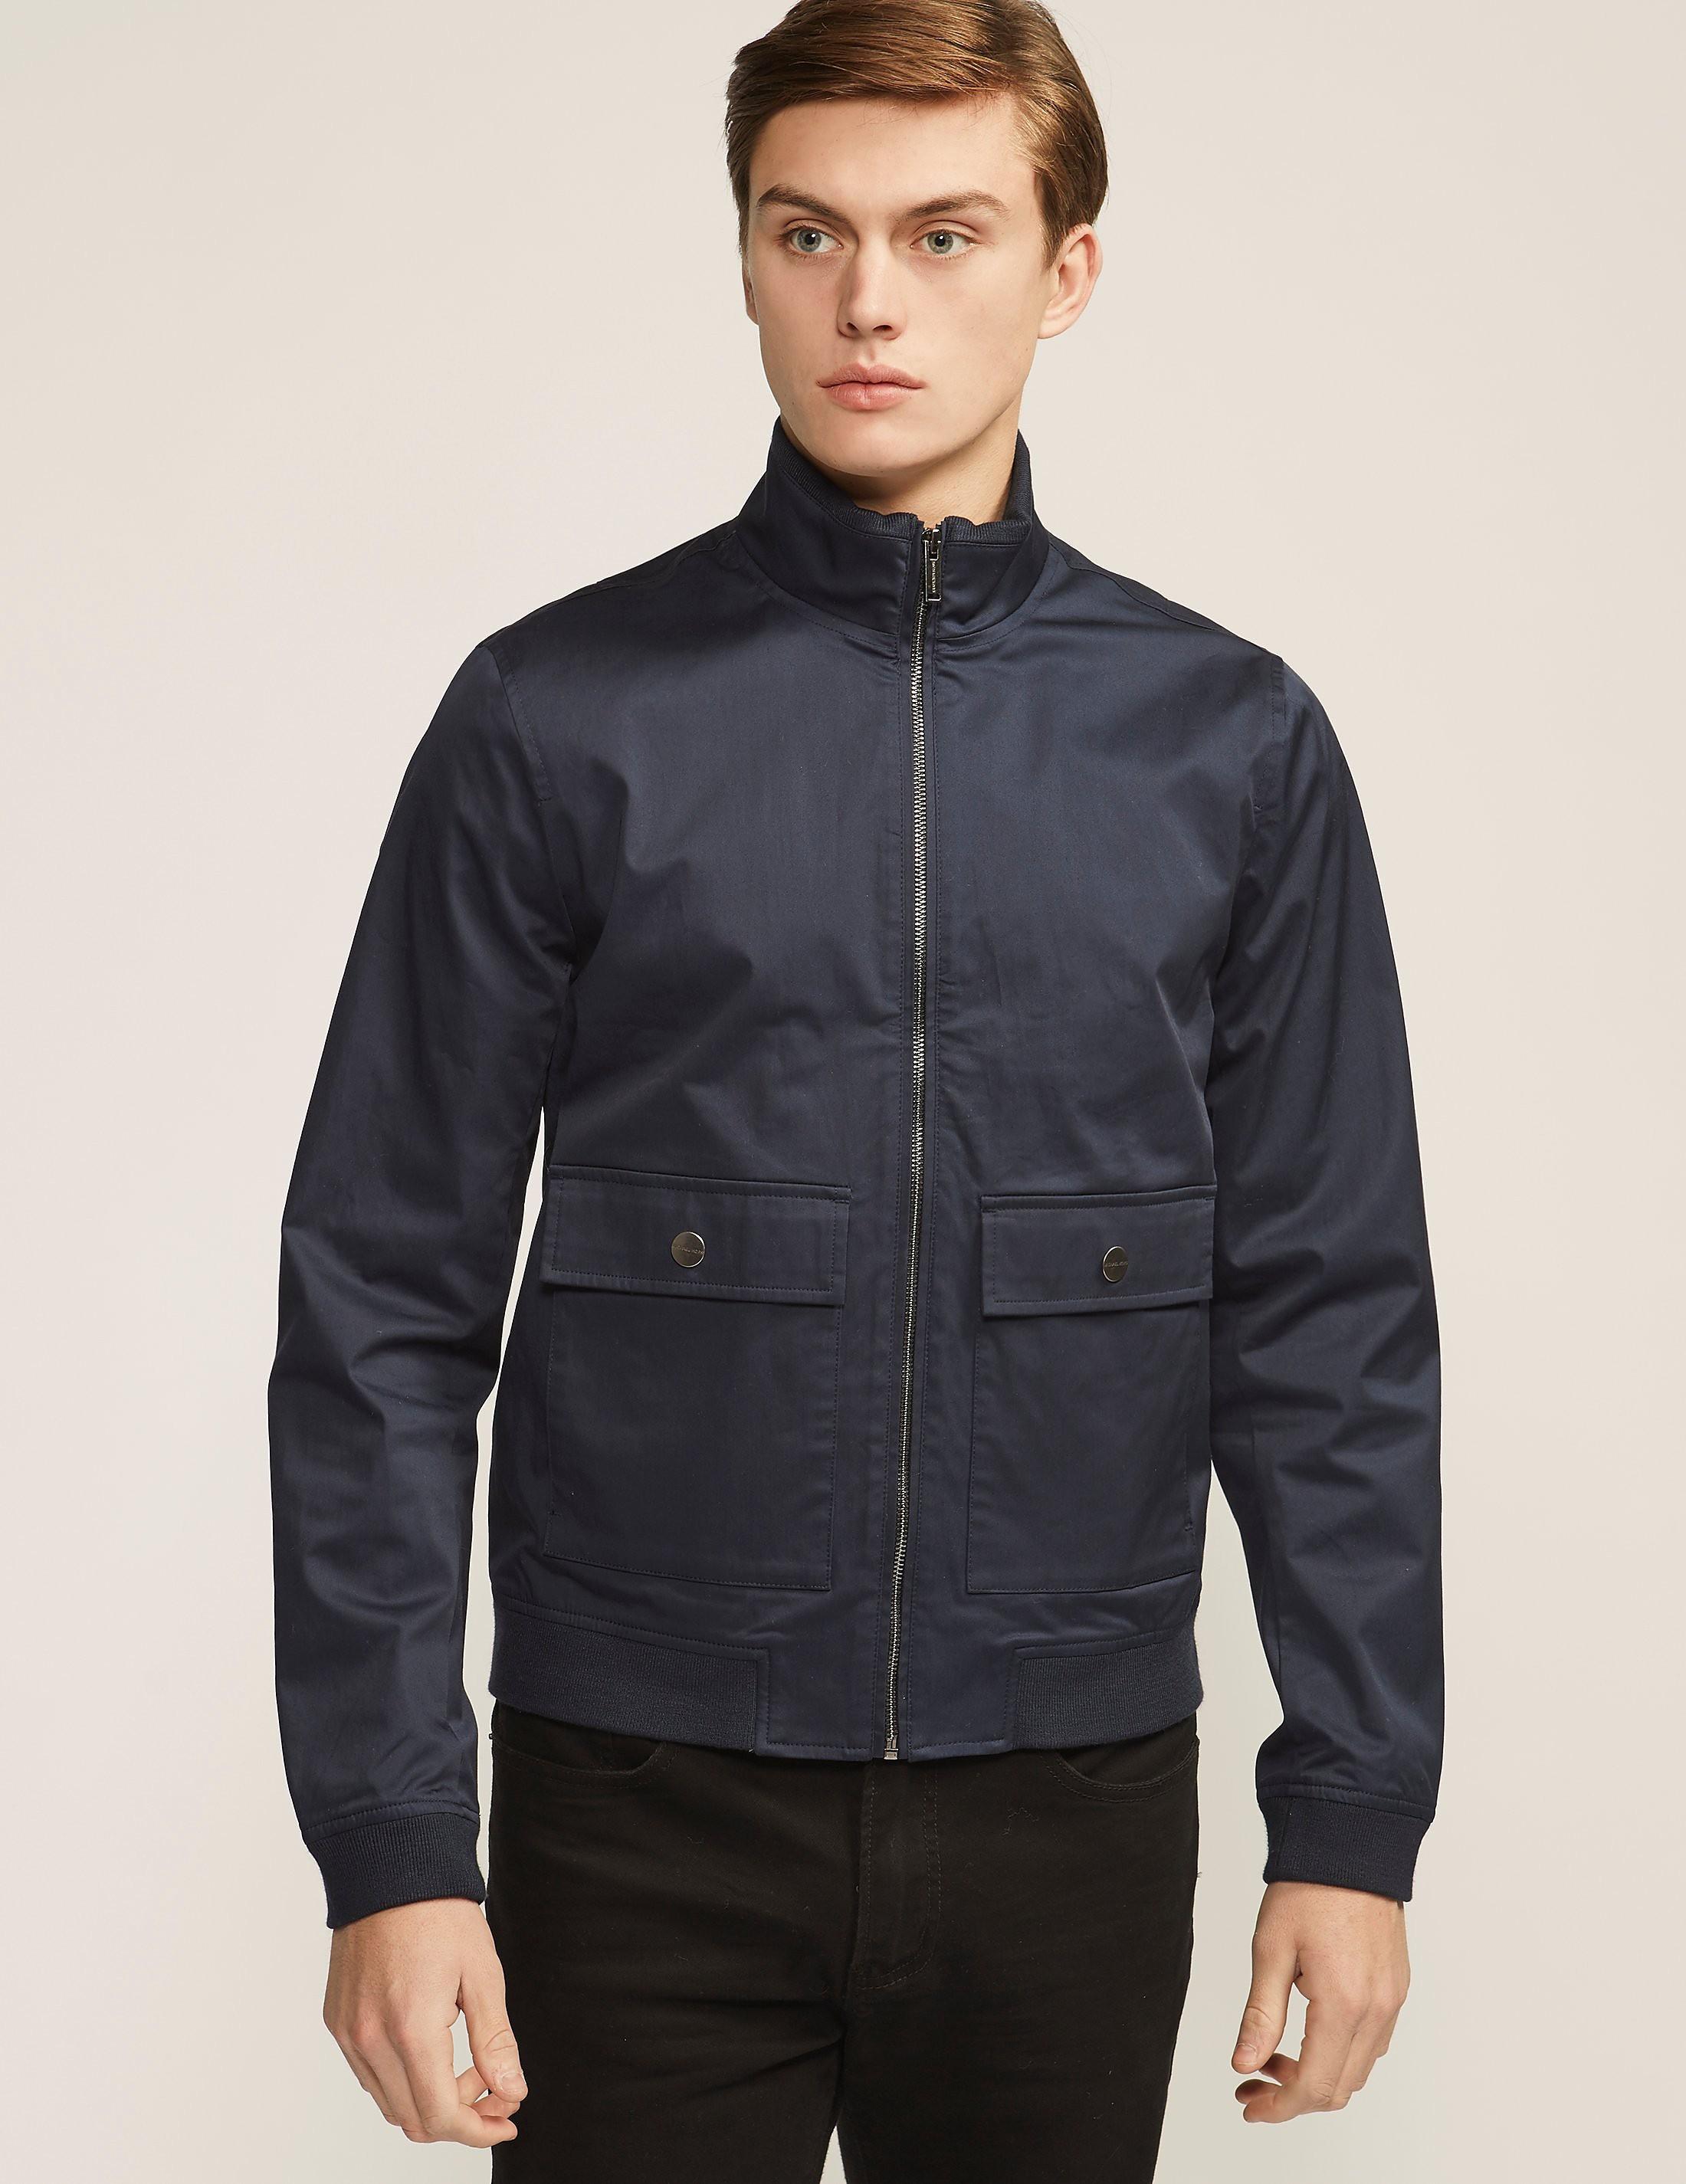 Michael Kors Pocket Bomber Jacket